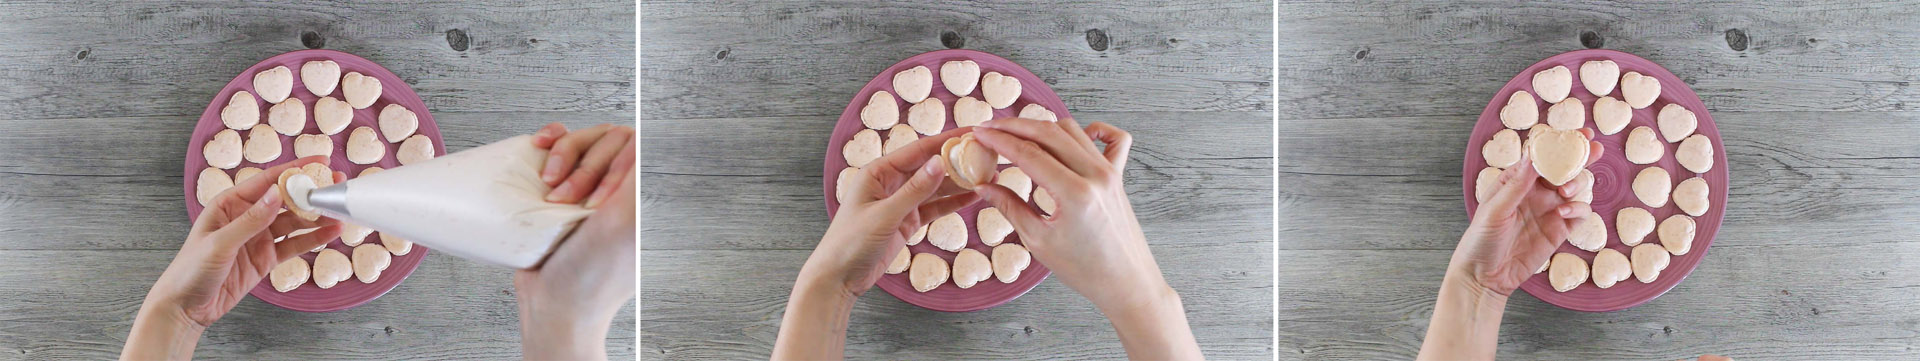 preparazione macarons san valentino step8